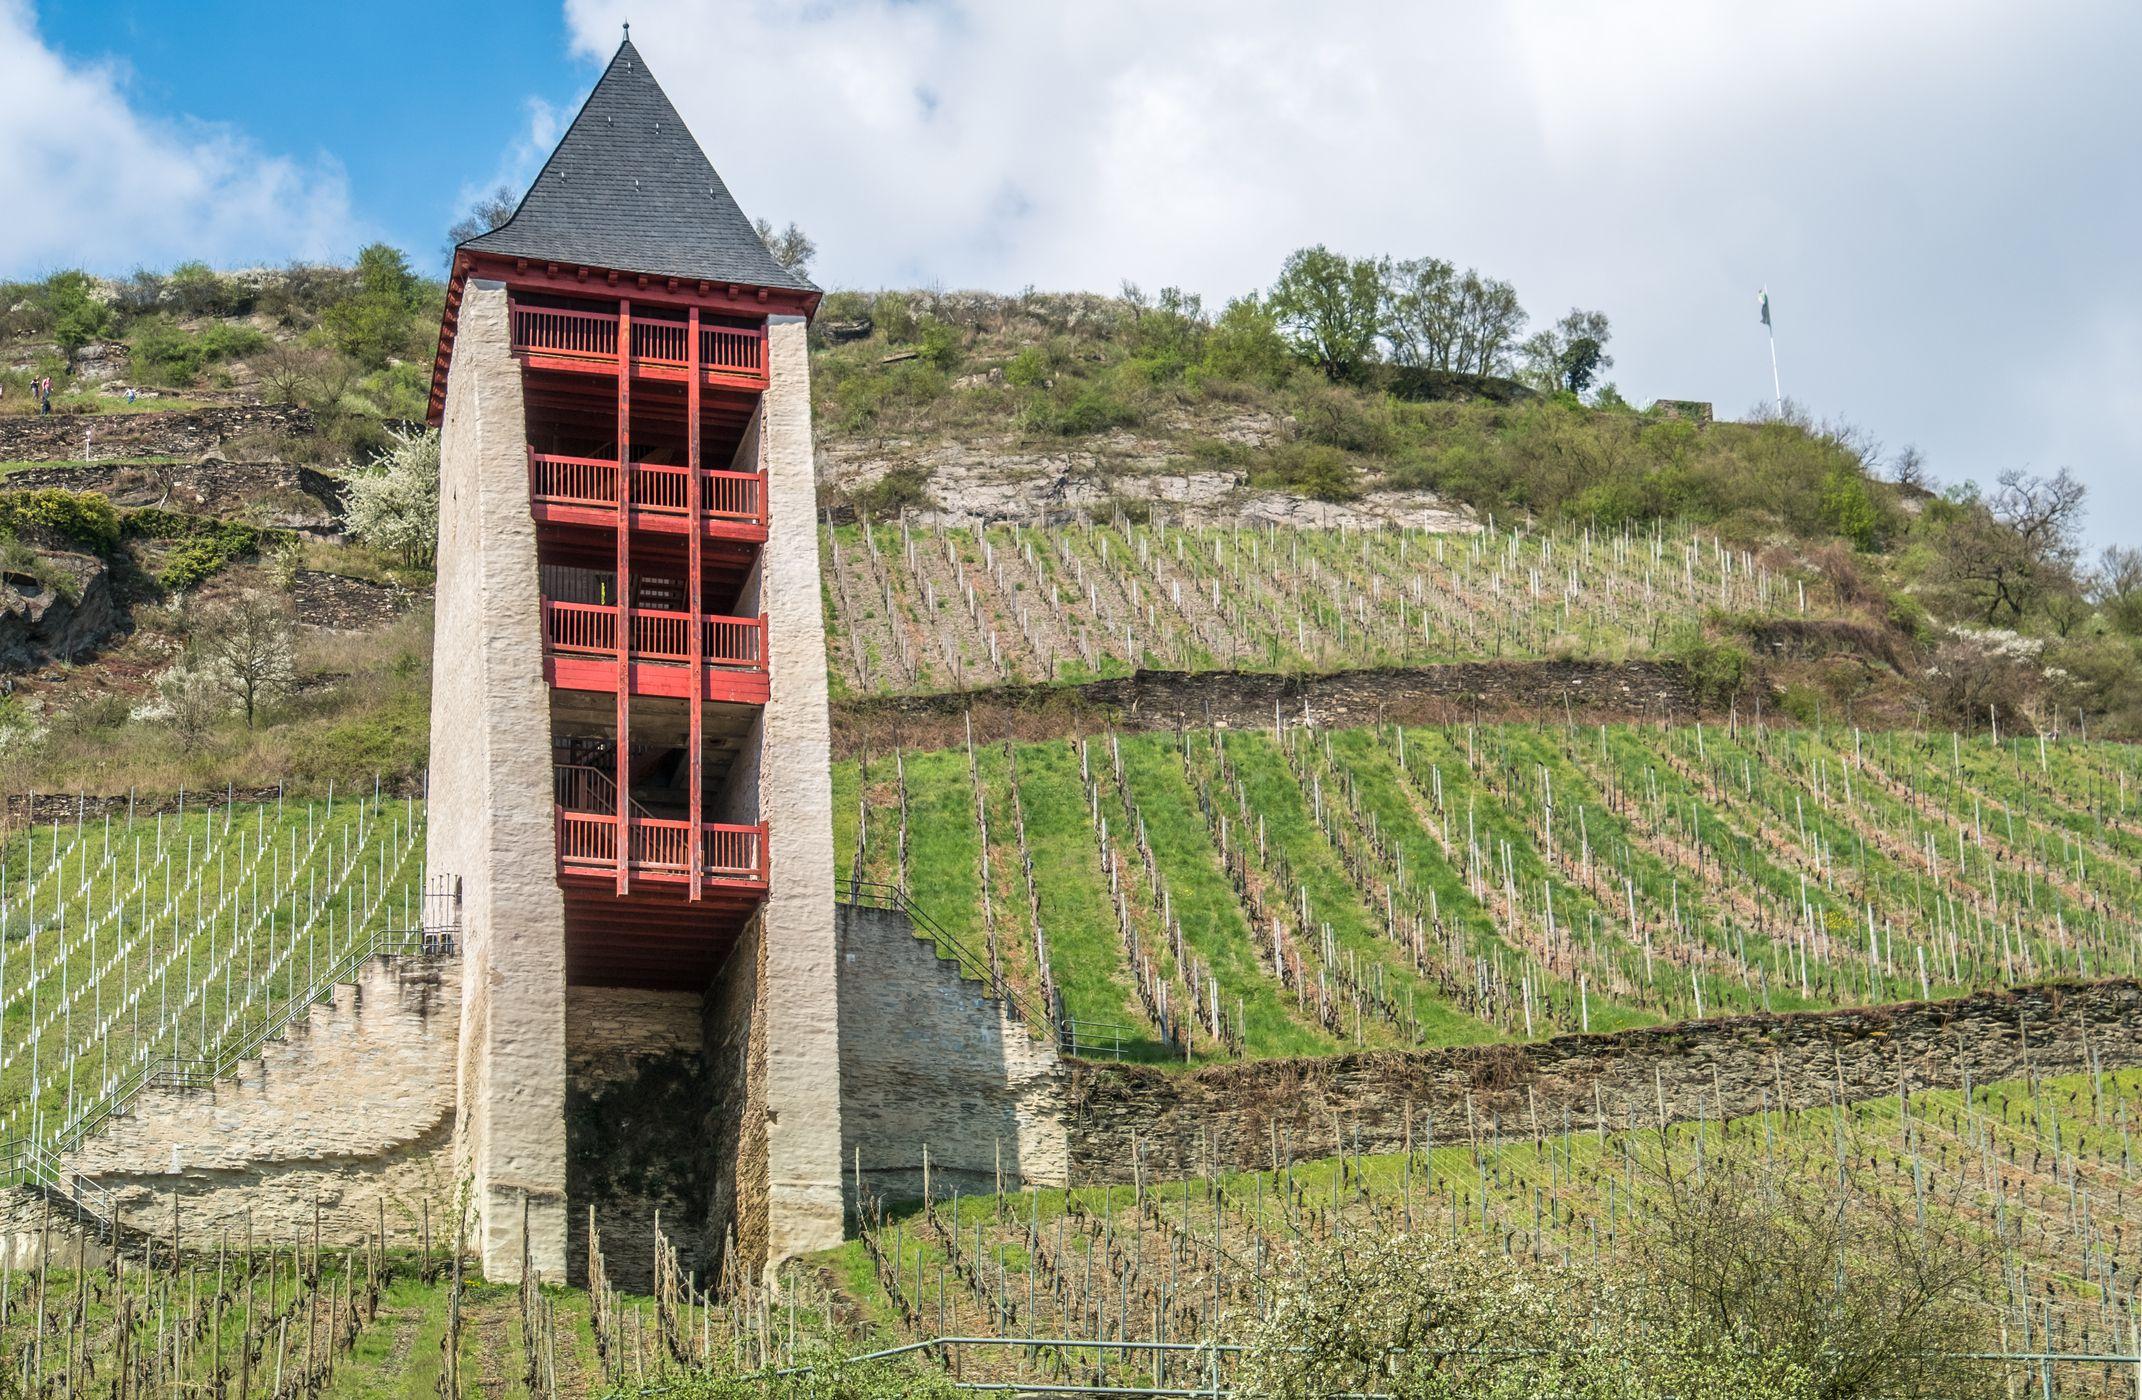 Bacharach's Postenturm